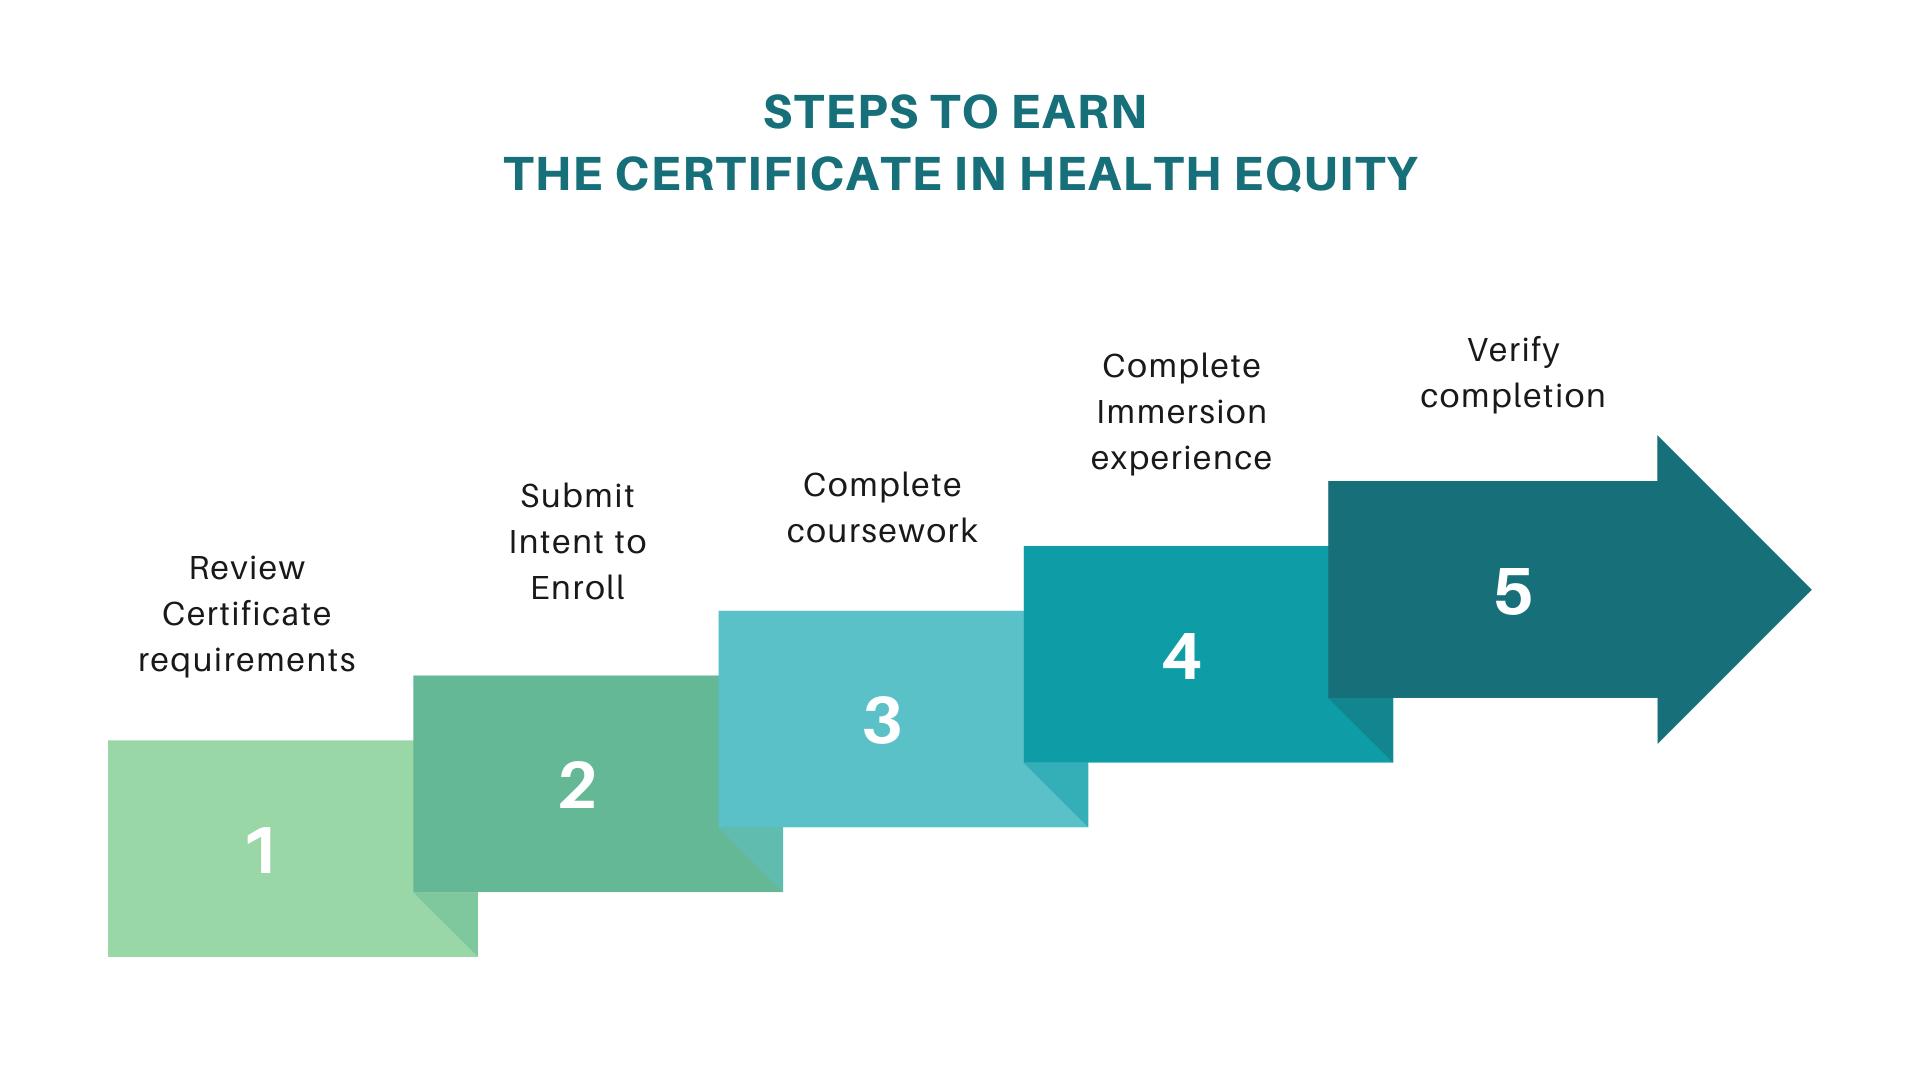 steps to earn certificate